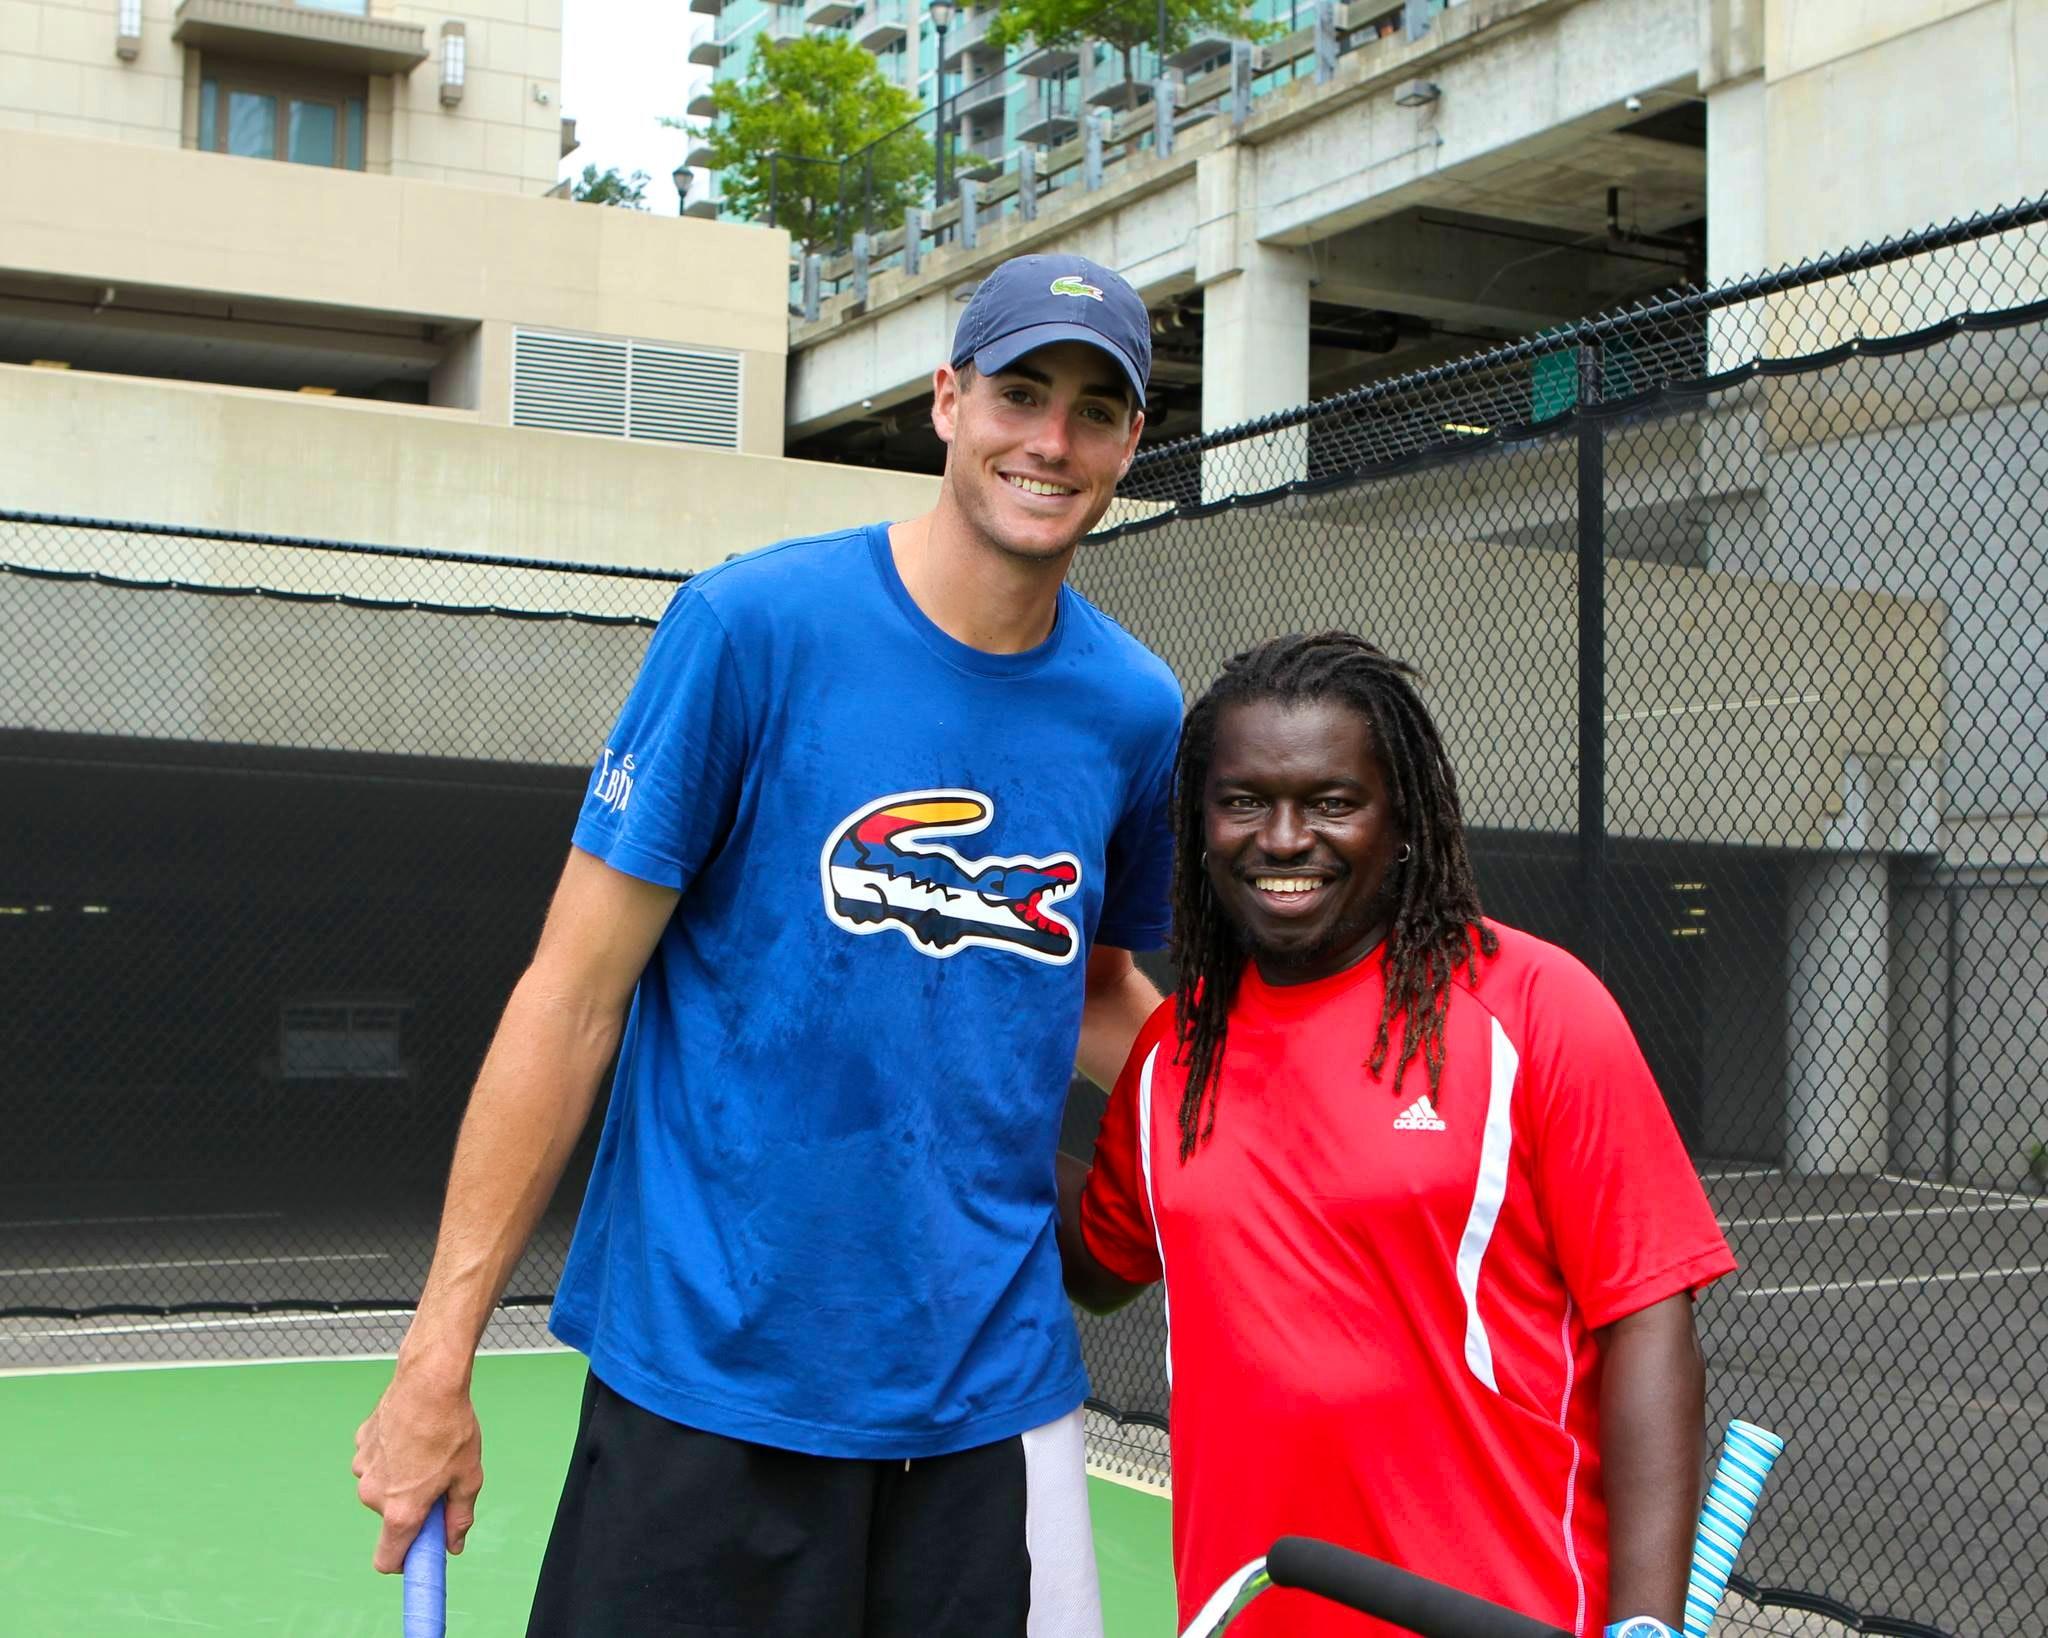 Bryan S. teaches tennis lessons in Lithonia, GA